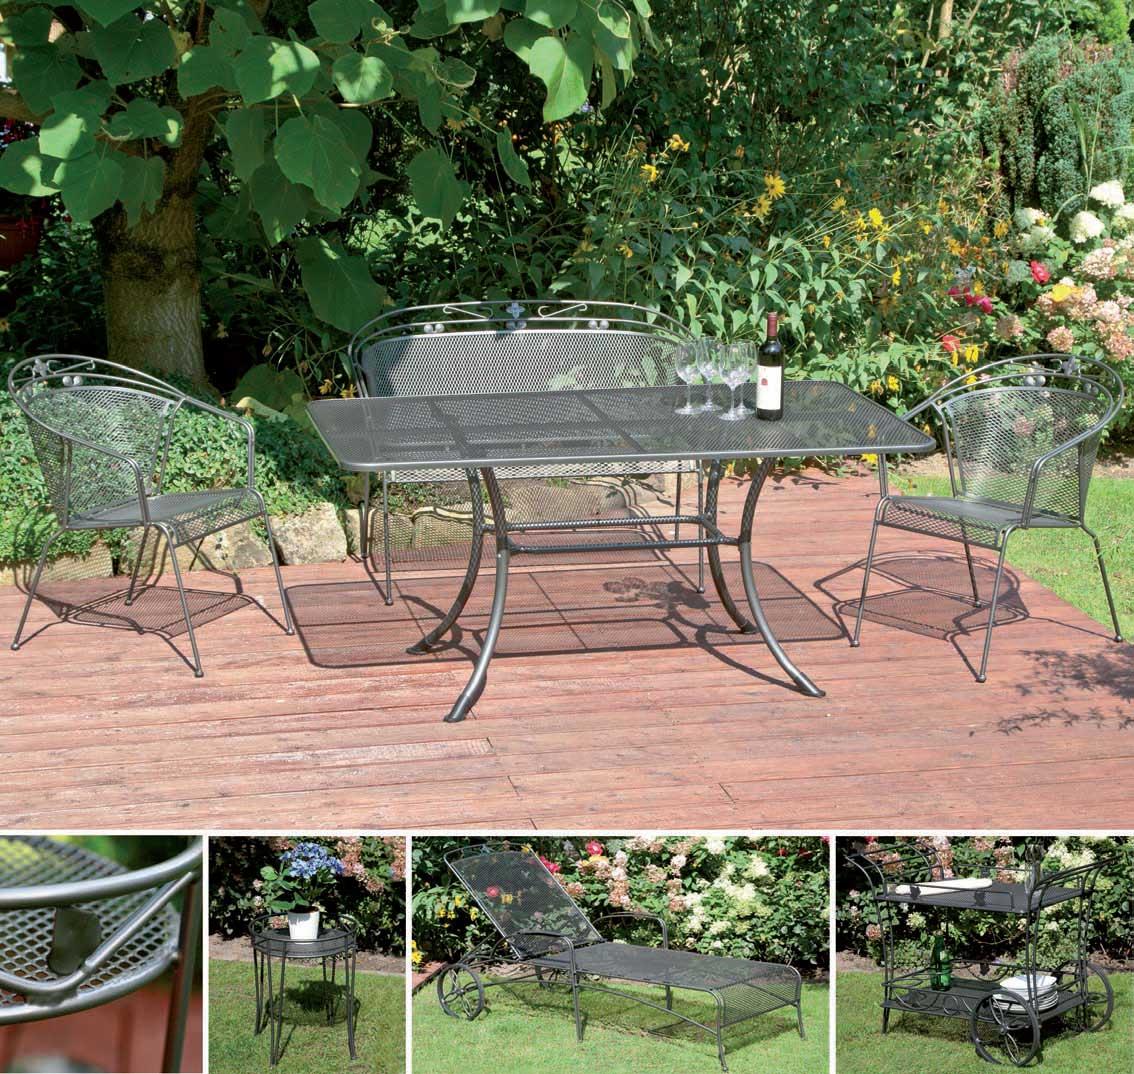 gartentisch streckmetall 145x90cm eisengrau bei. Black Bedroom Furniture Sets. Home Design Ideas